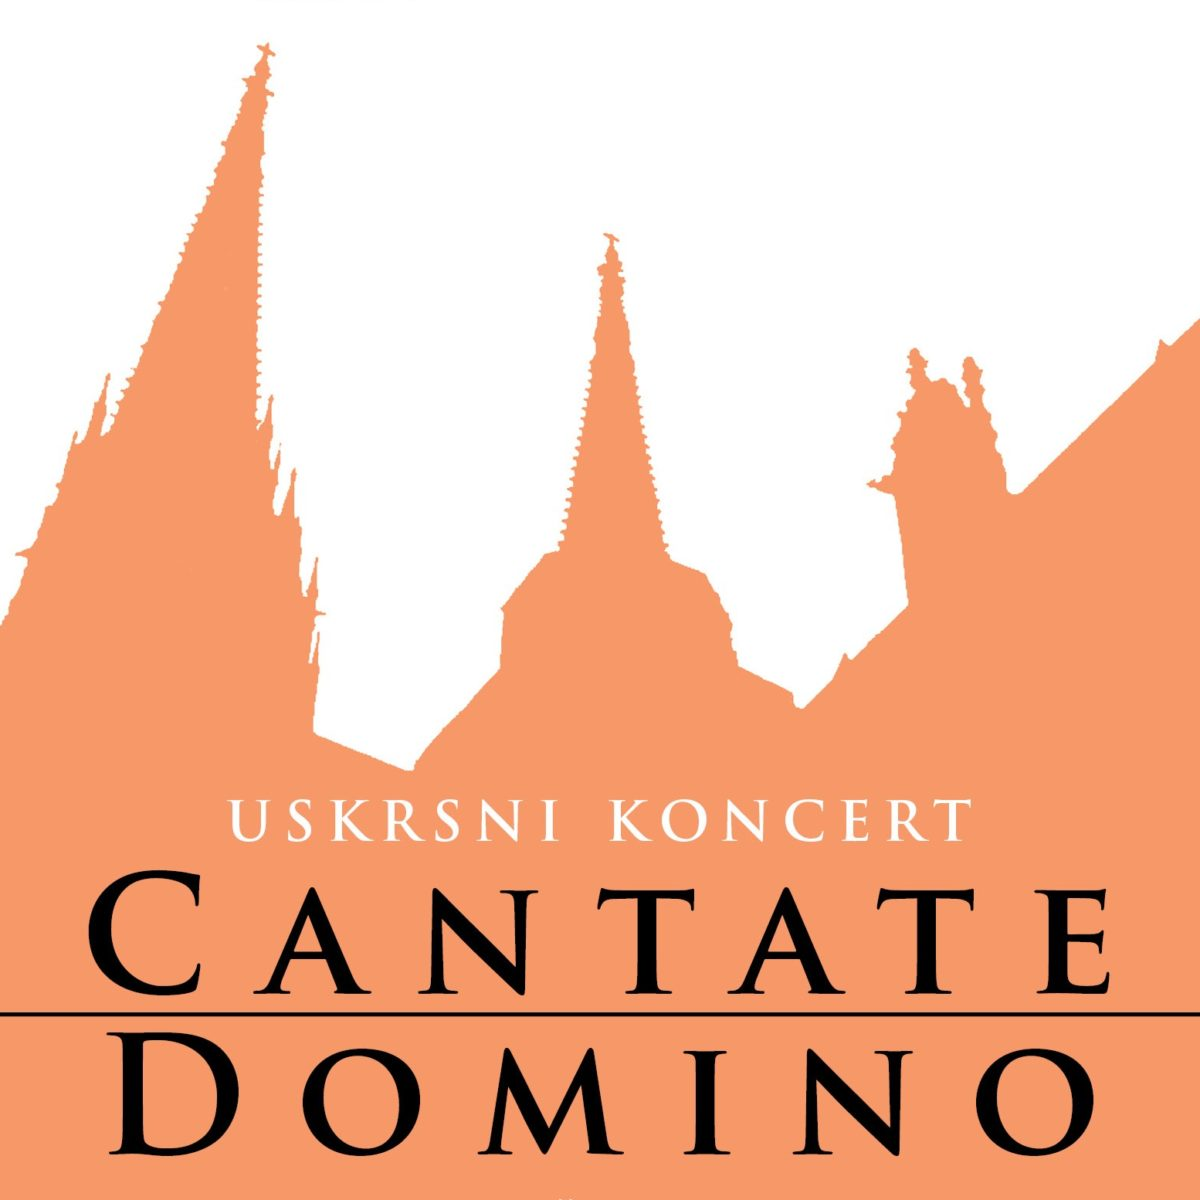 Uskrsni koncert CANTATE DOMINO